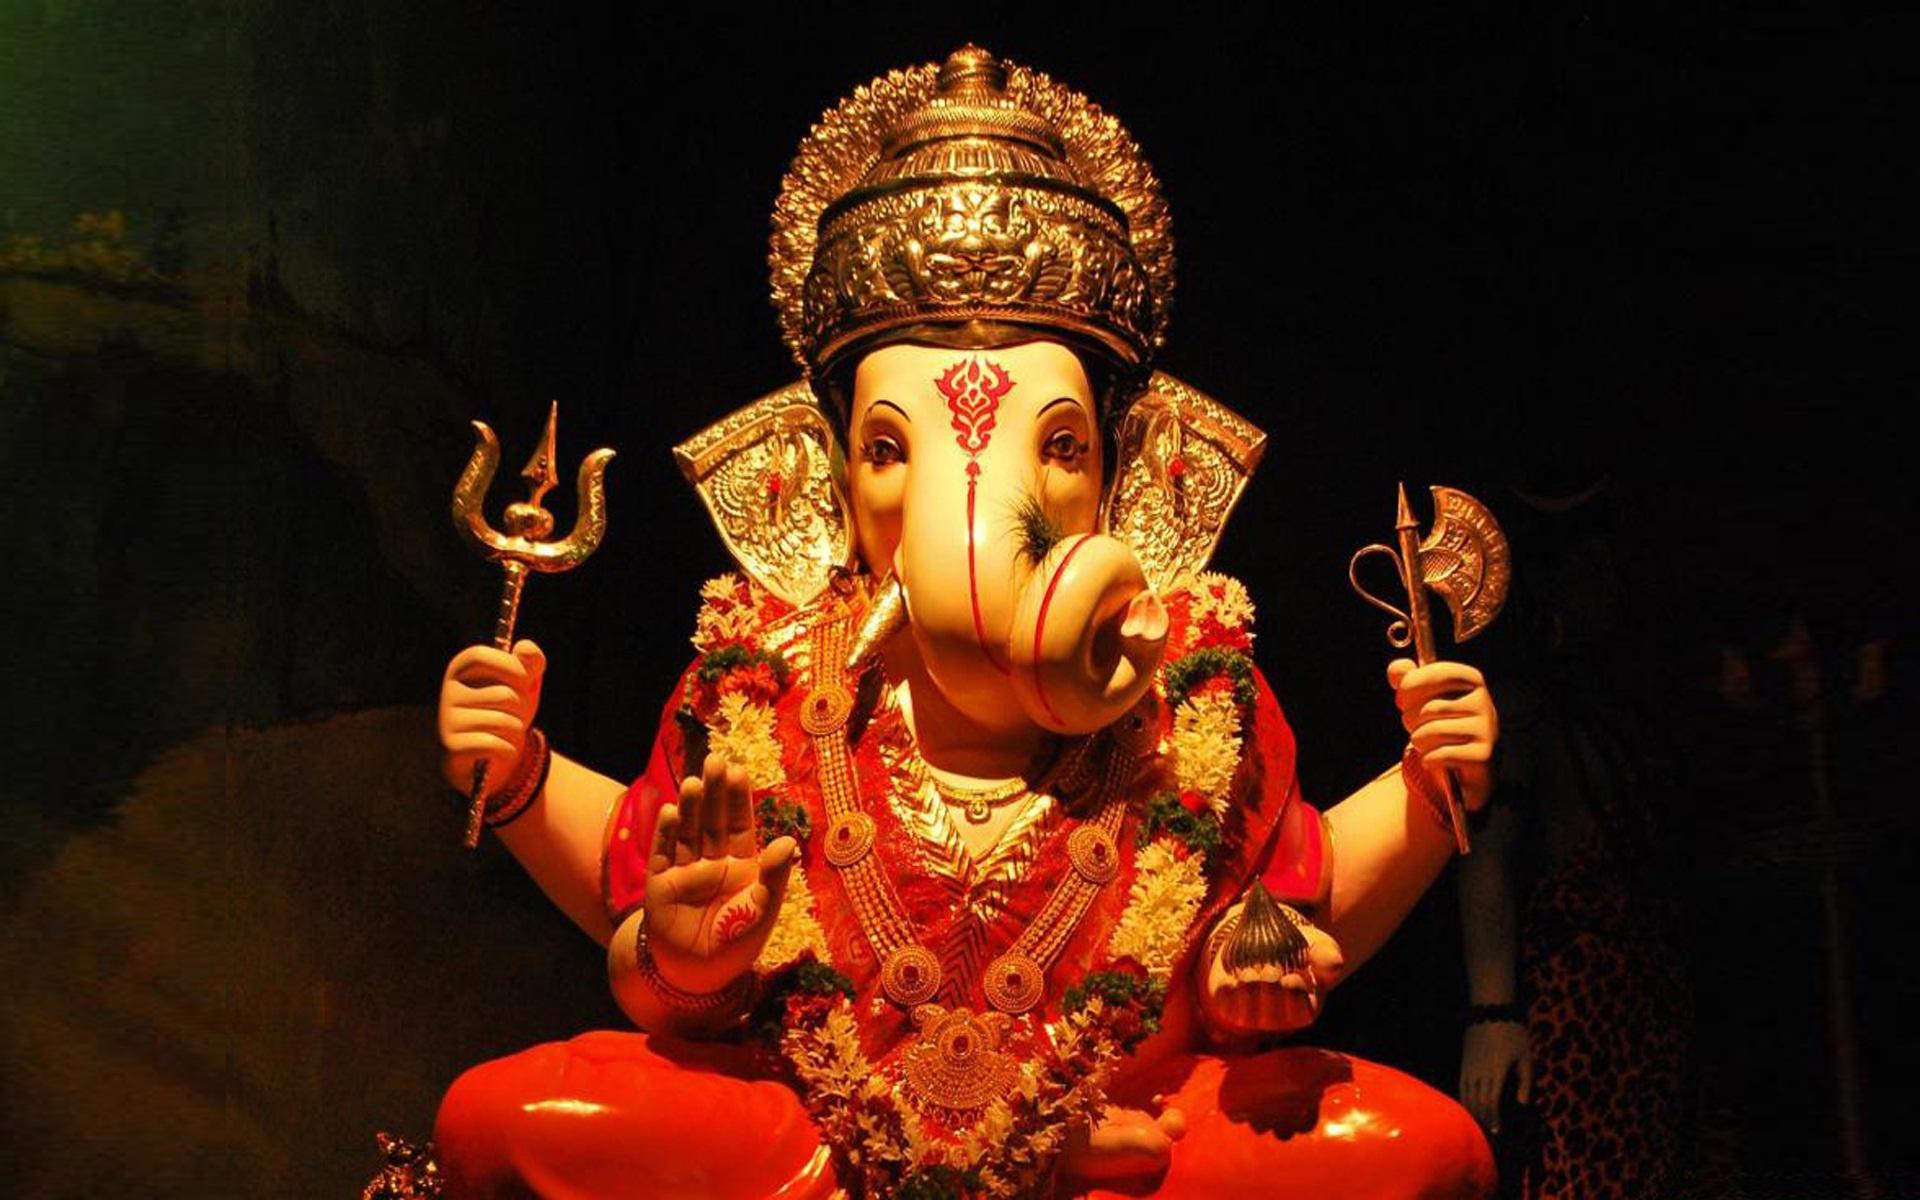 Ganesh festival, Ganesh Chaturthi, Ganesh Utsav, Ganesh Chaturthi 2019, Anant Chaturdashi, Sri ganesh, Lord Ganesh, श्री गणेश, गणेश चतुर्थी, गणेश उत्सव, अनंत चतुर्दशी